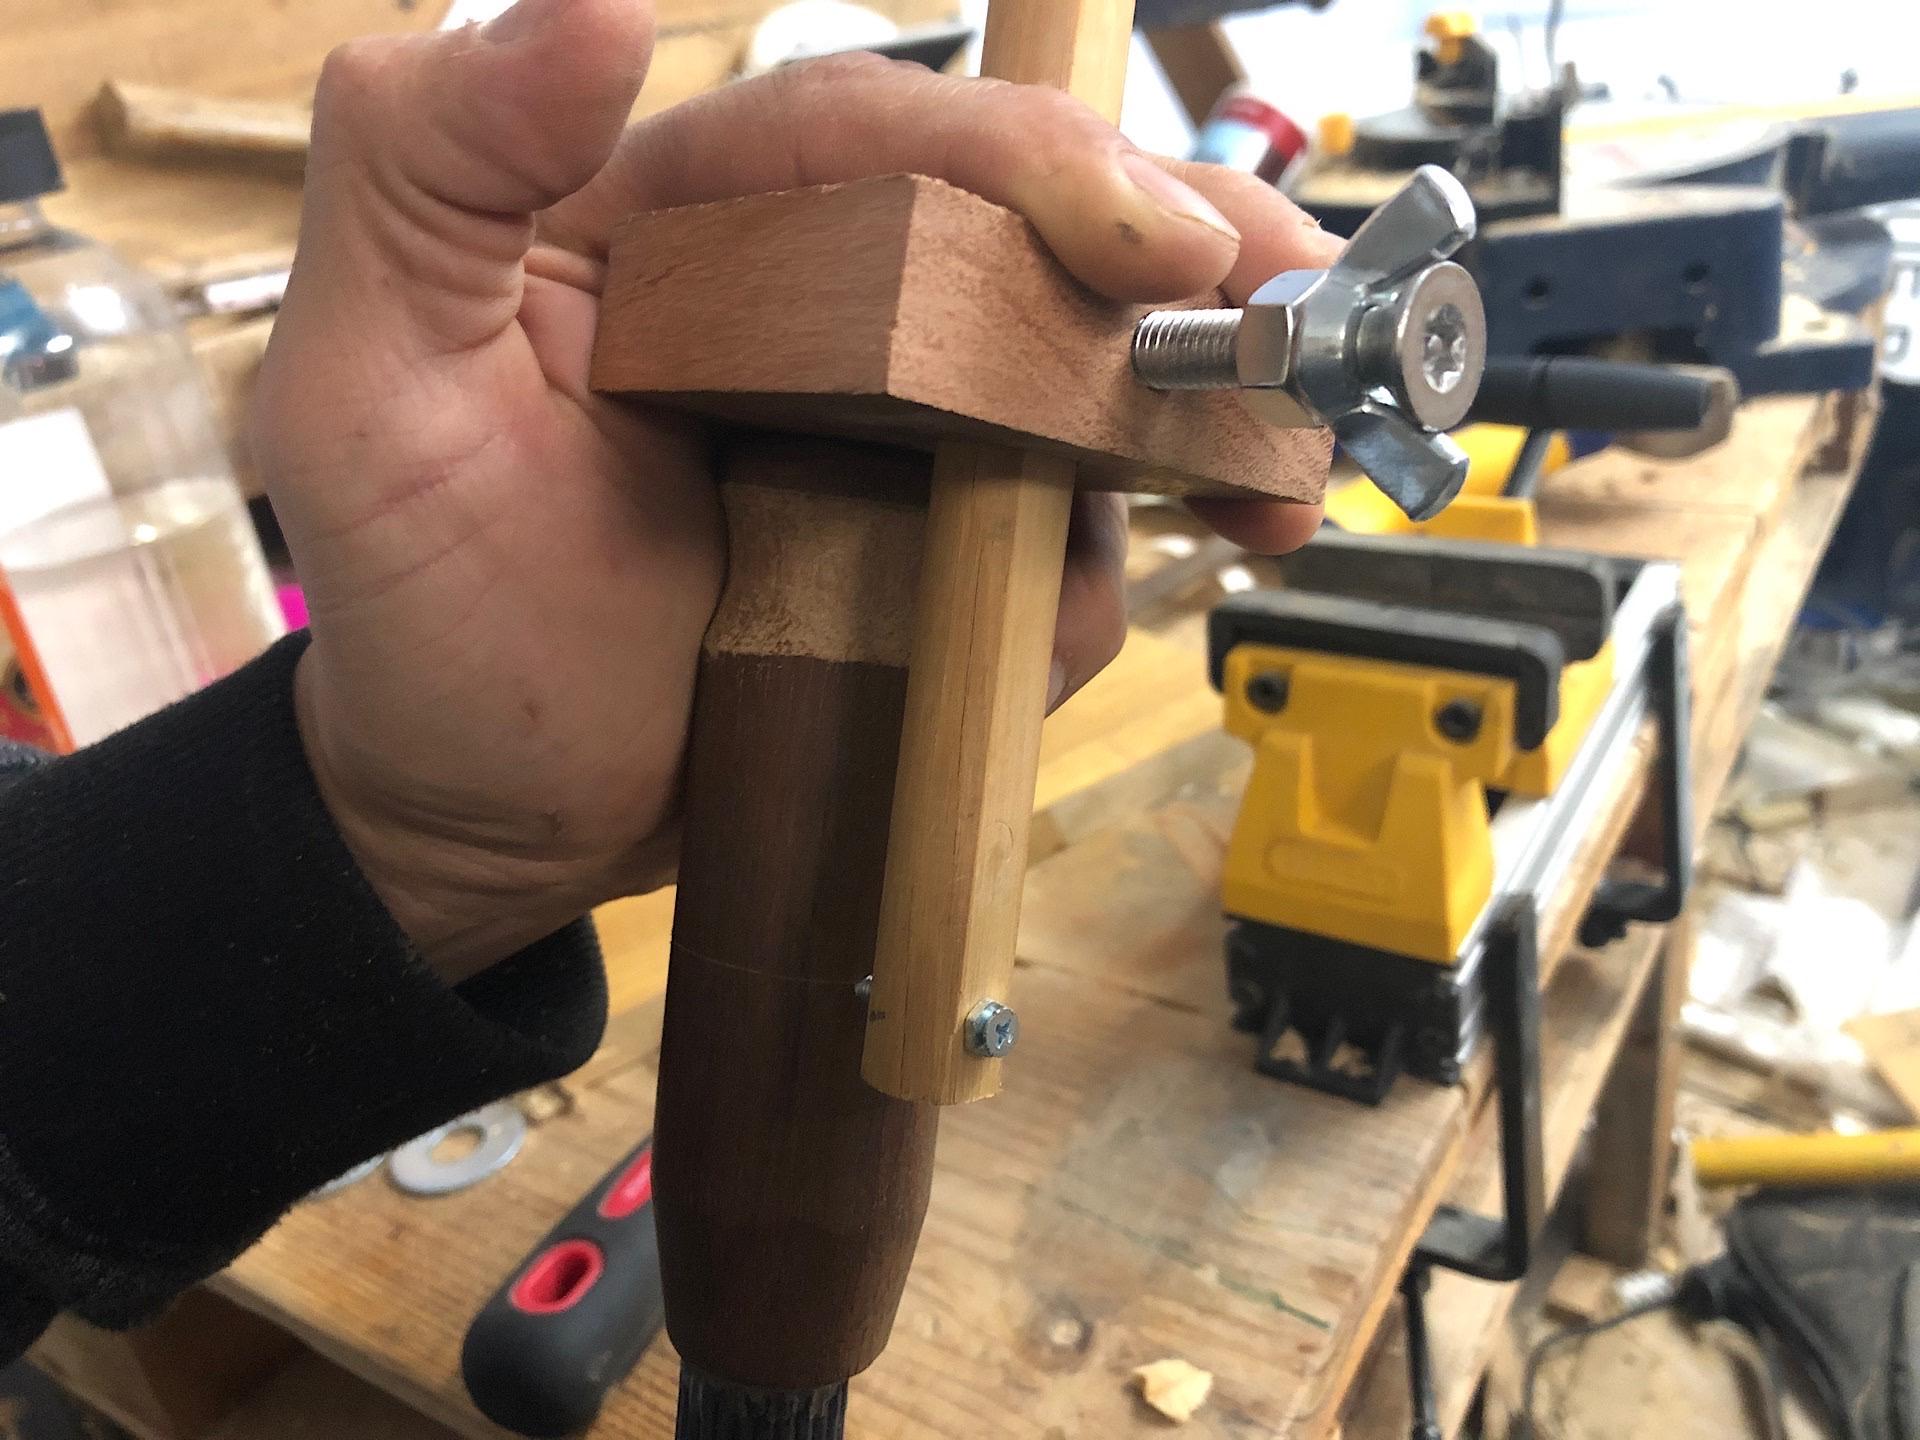 Marking the handle